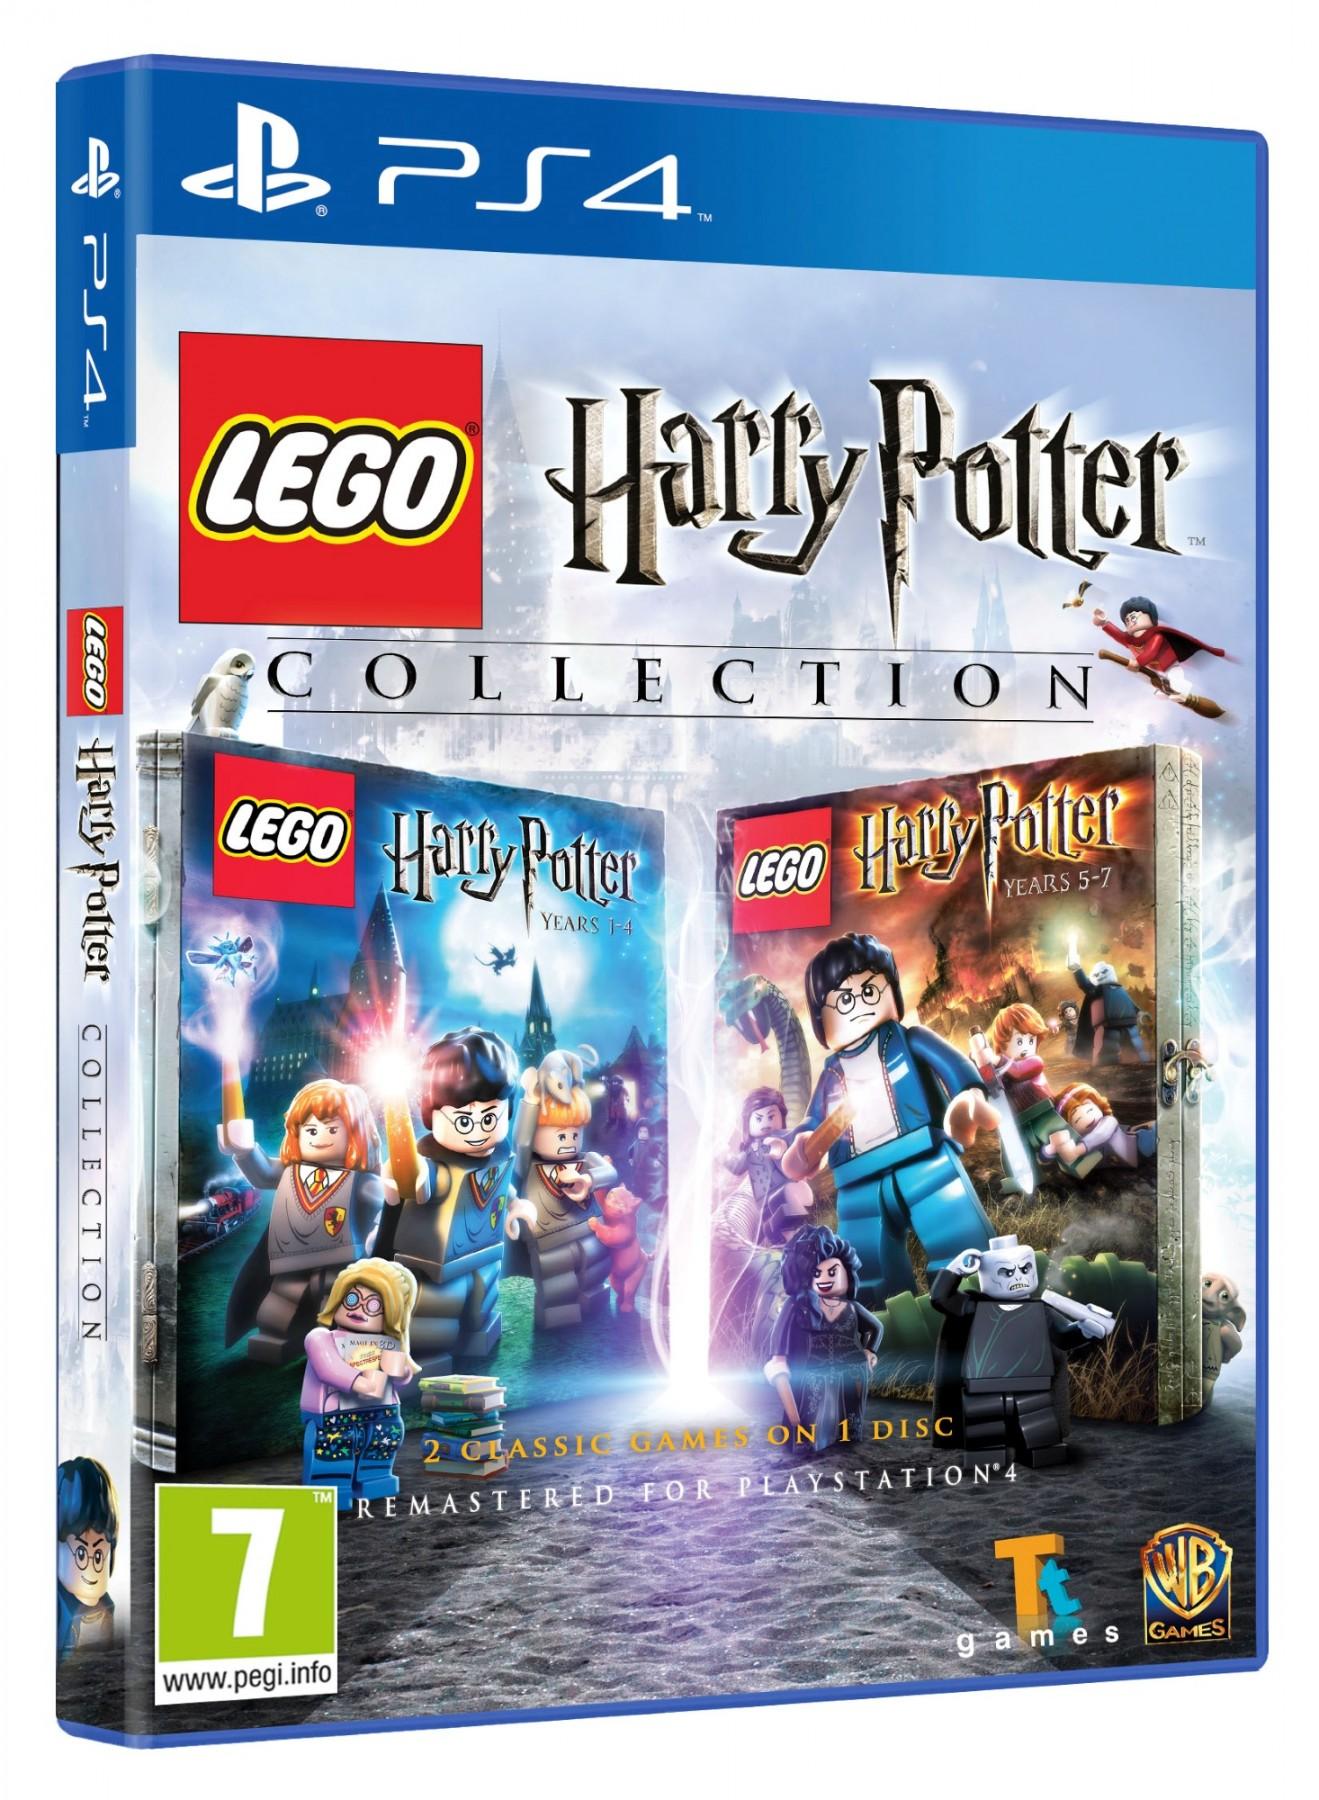 LEGO Harry Potter Collection | LEGO Гарри Поттер Коллекция PS4